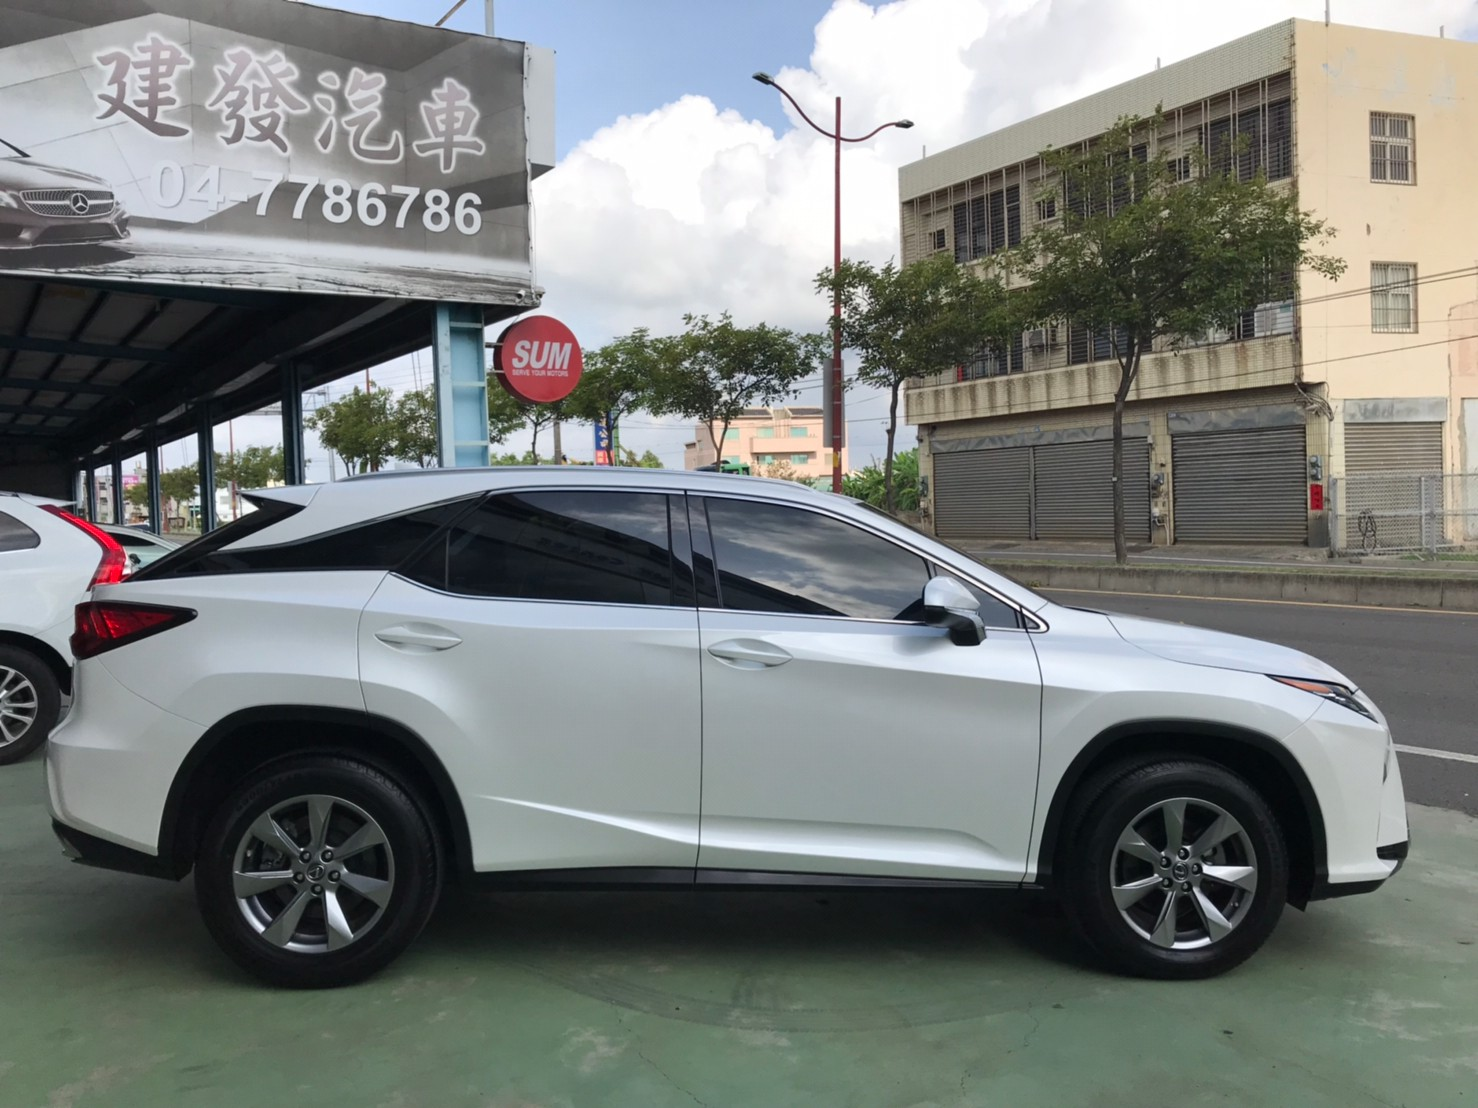 2018RX300白SUM151.8 2.0cc 主動跟車 AEB自動緊急煞車 車道偏離 盲點補助_210620_2